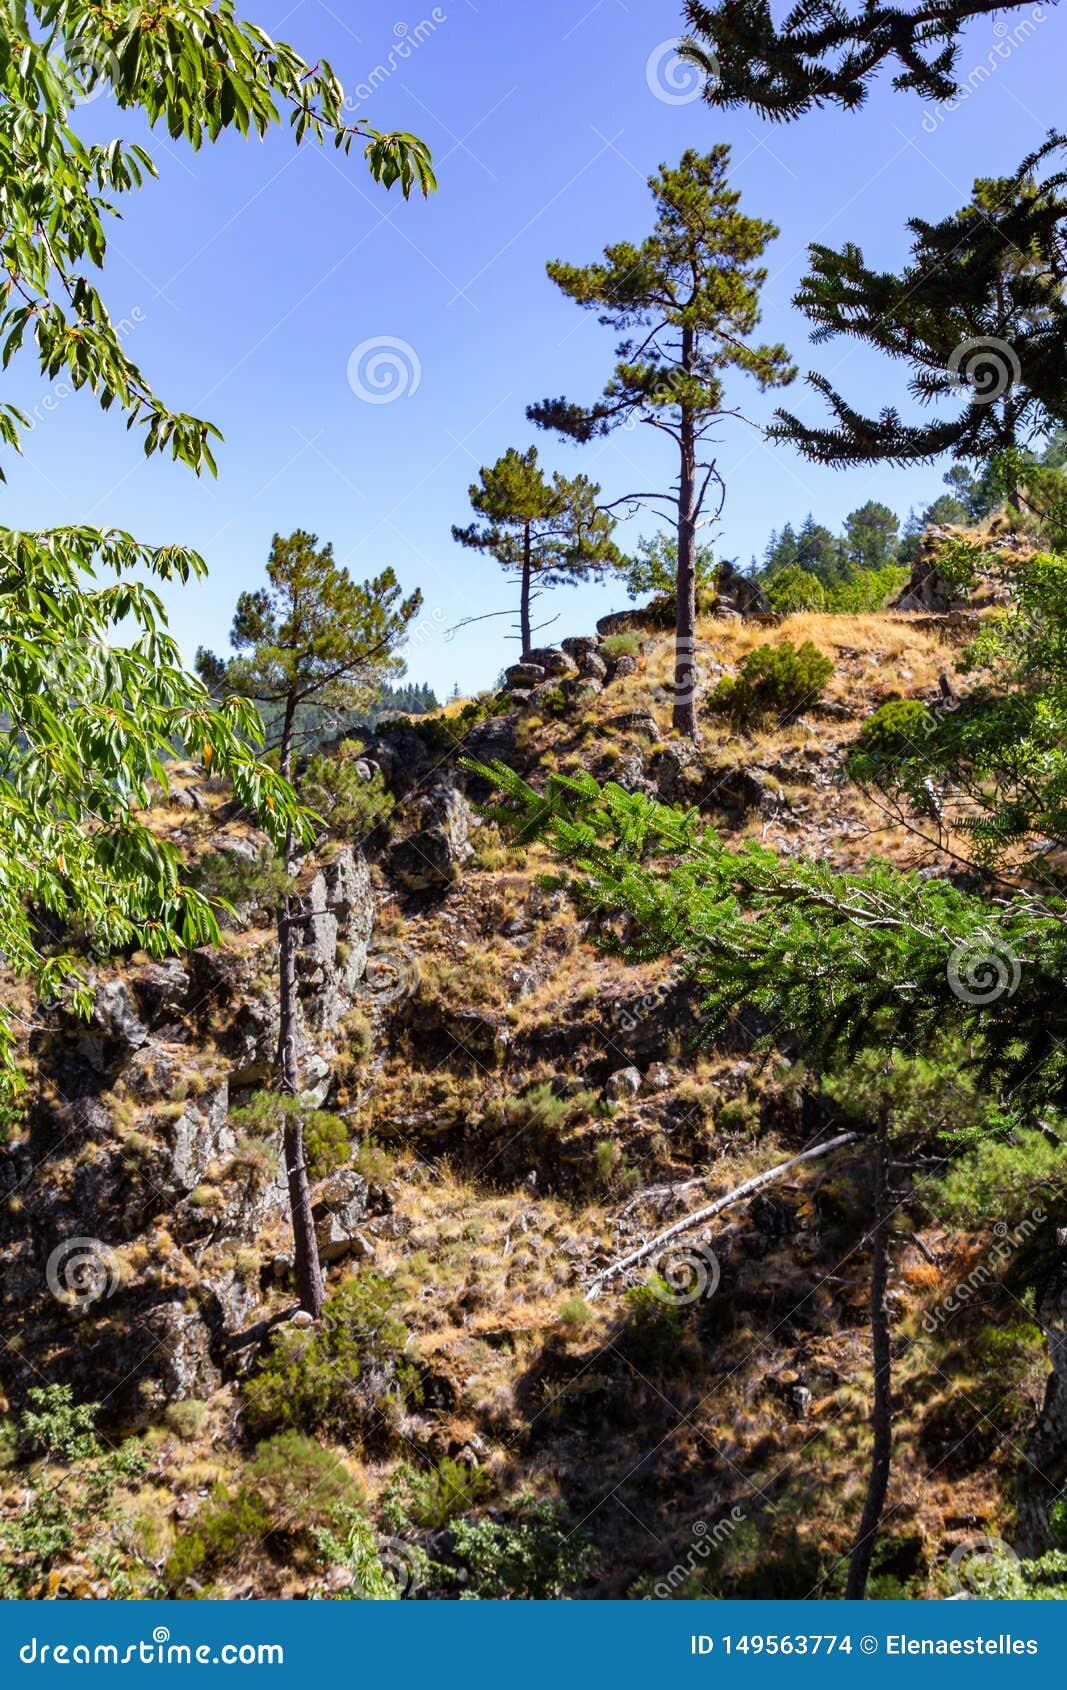 Hiking route in the Serra da Estrela near Manteigas, Portugal